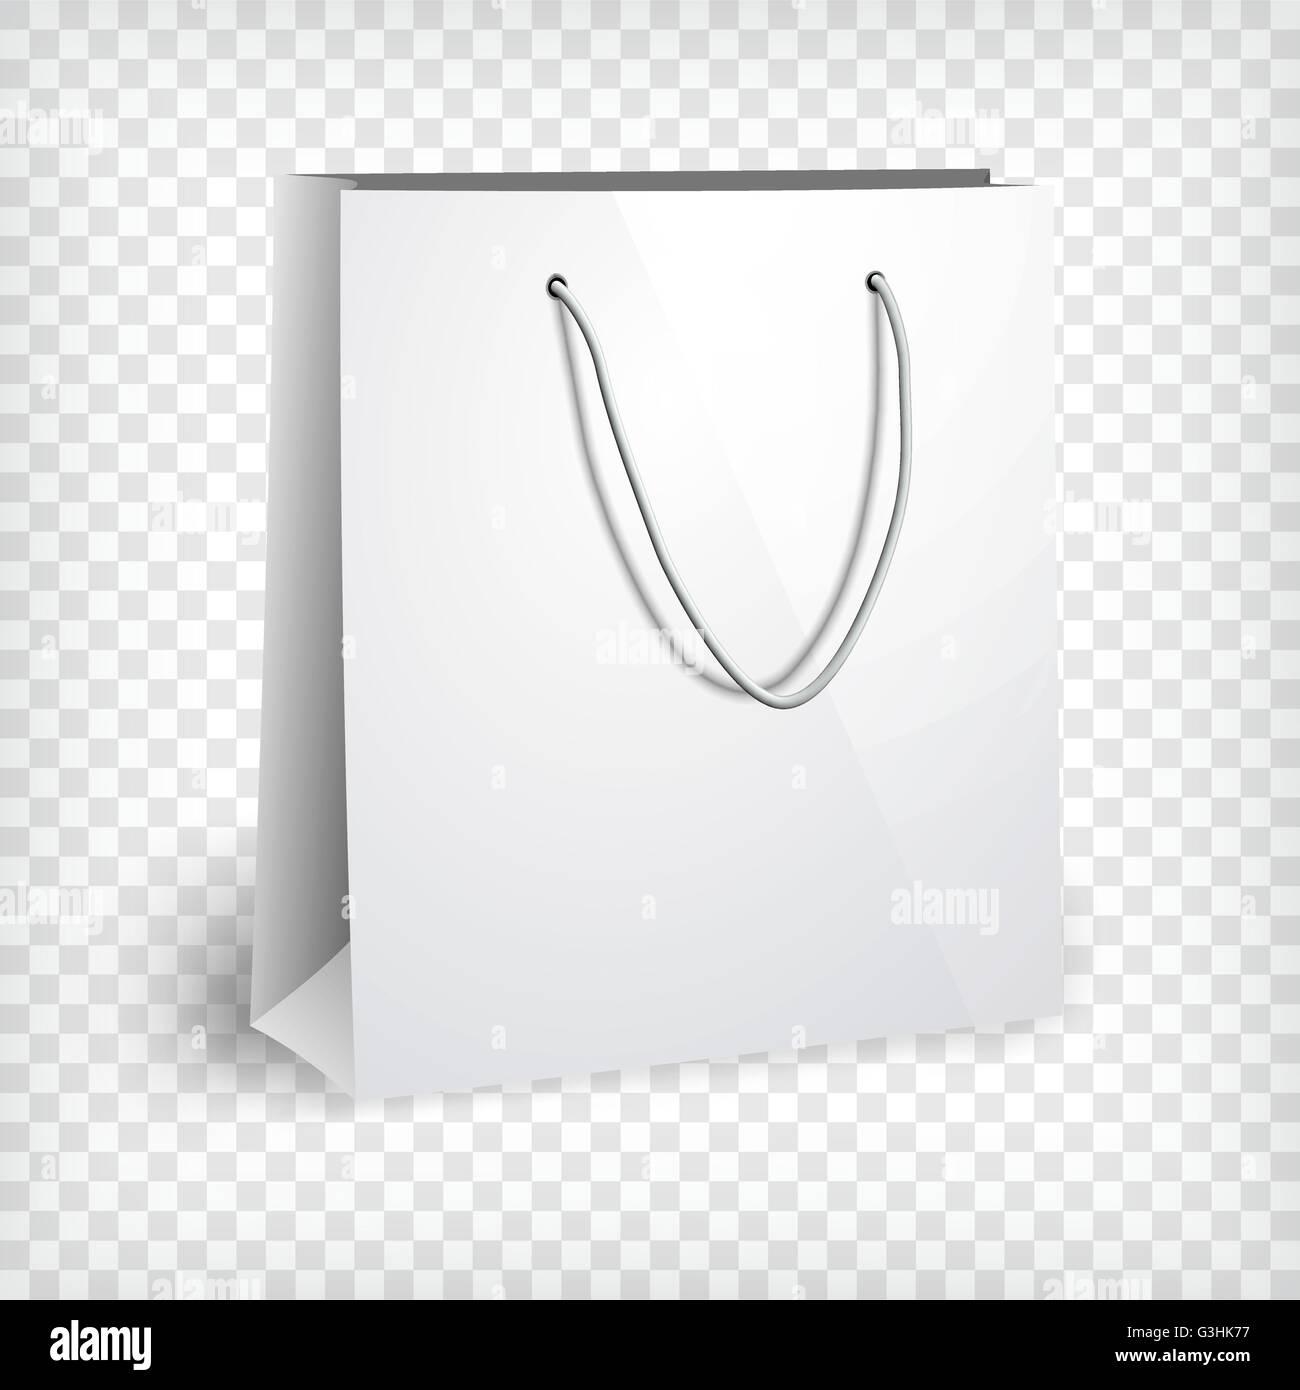 blank paper bag template stock vector art illustration vector